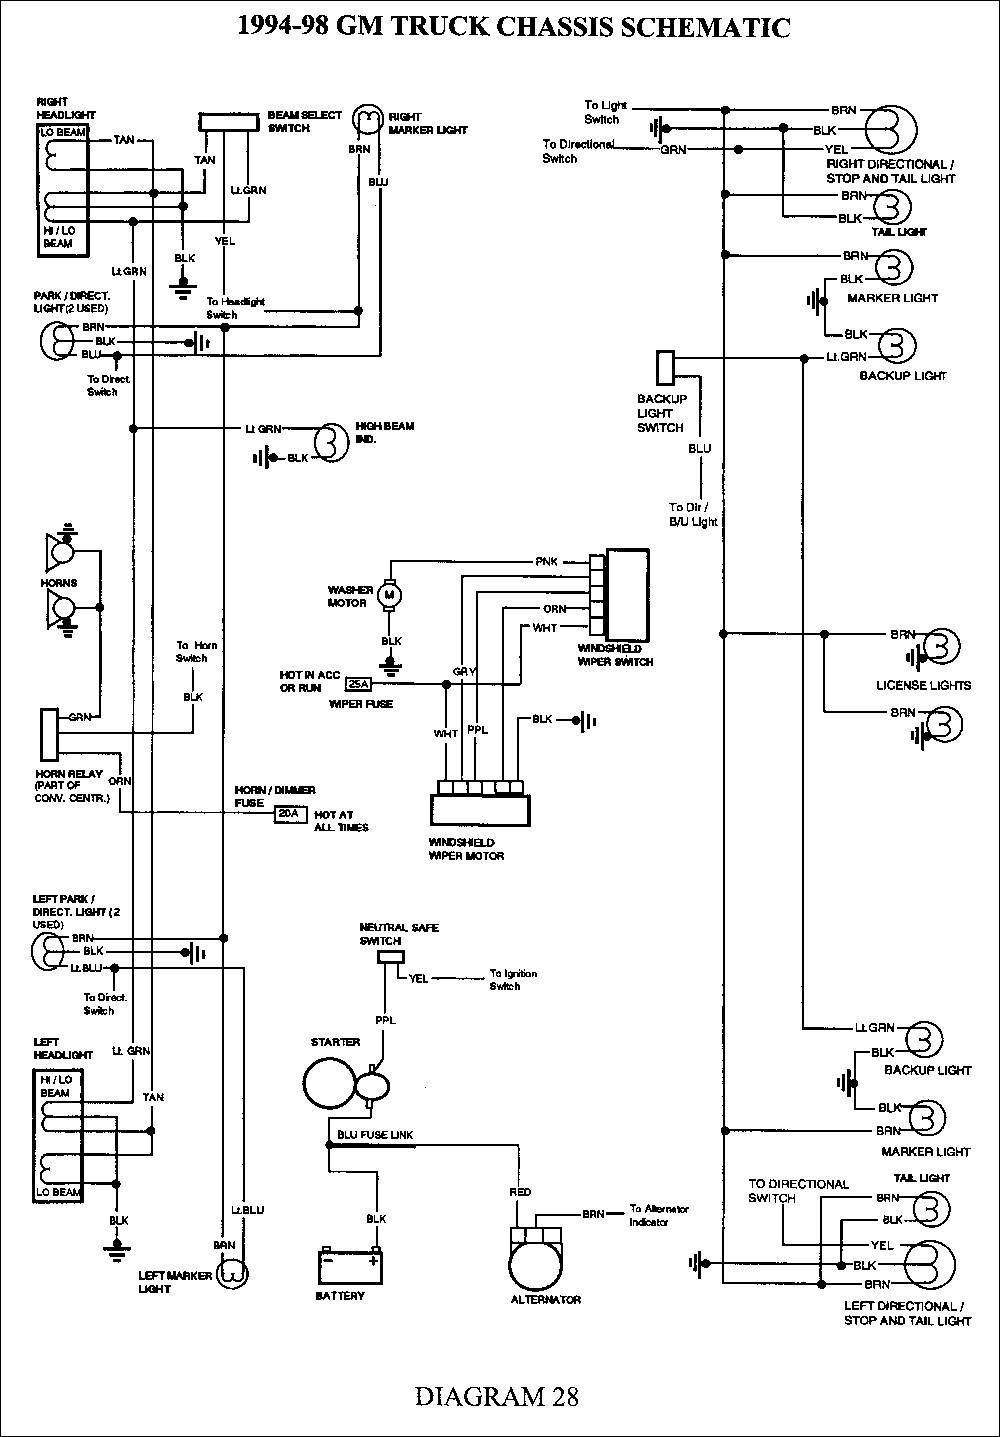 oo_1679] 2000 gmc sierra trailer wiring harness free diagram  urga sapre umng xeira favo lacu dict cajos mohammedshrine librar wiring 101